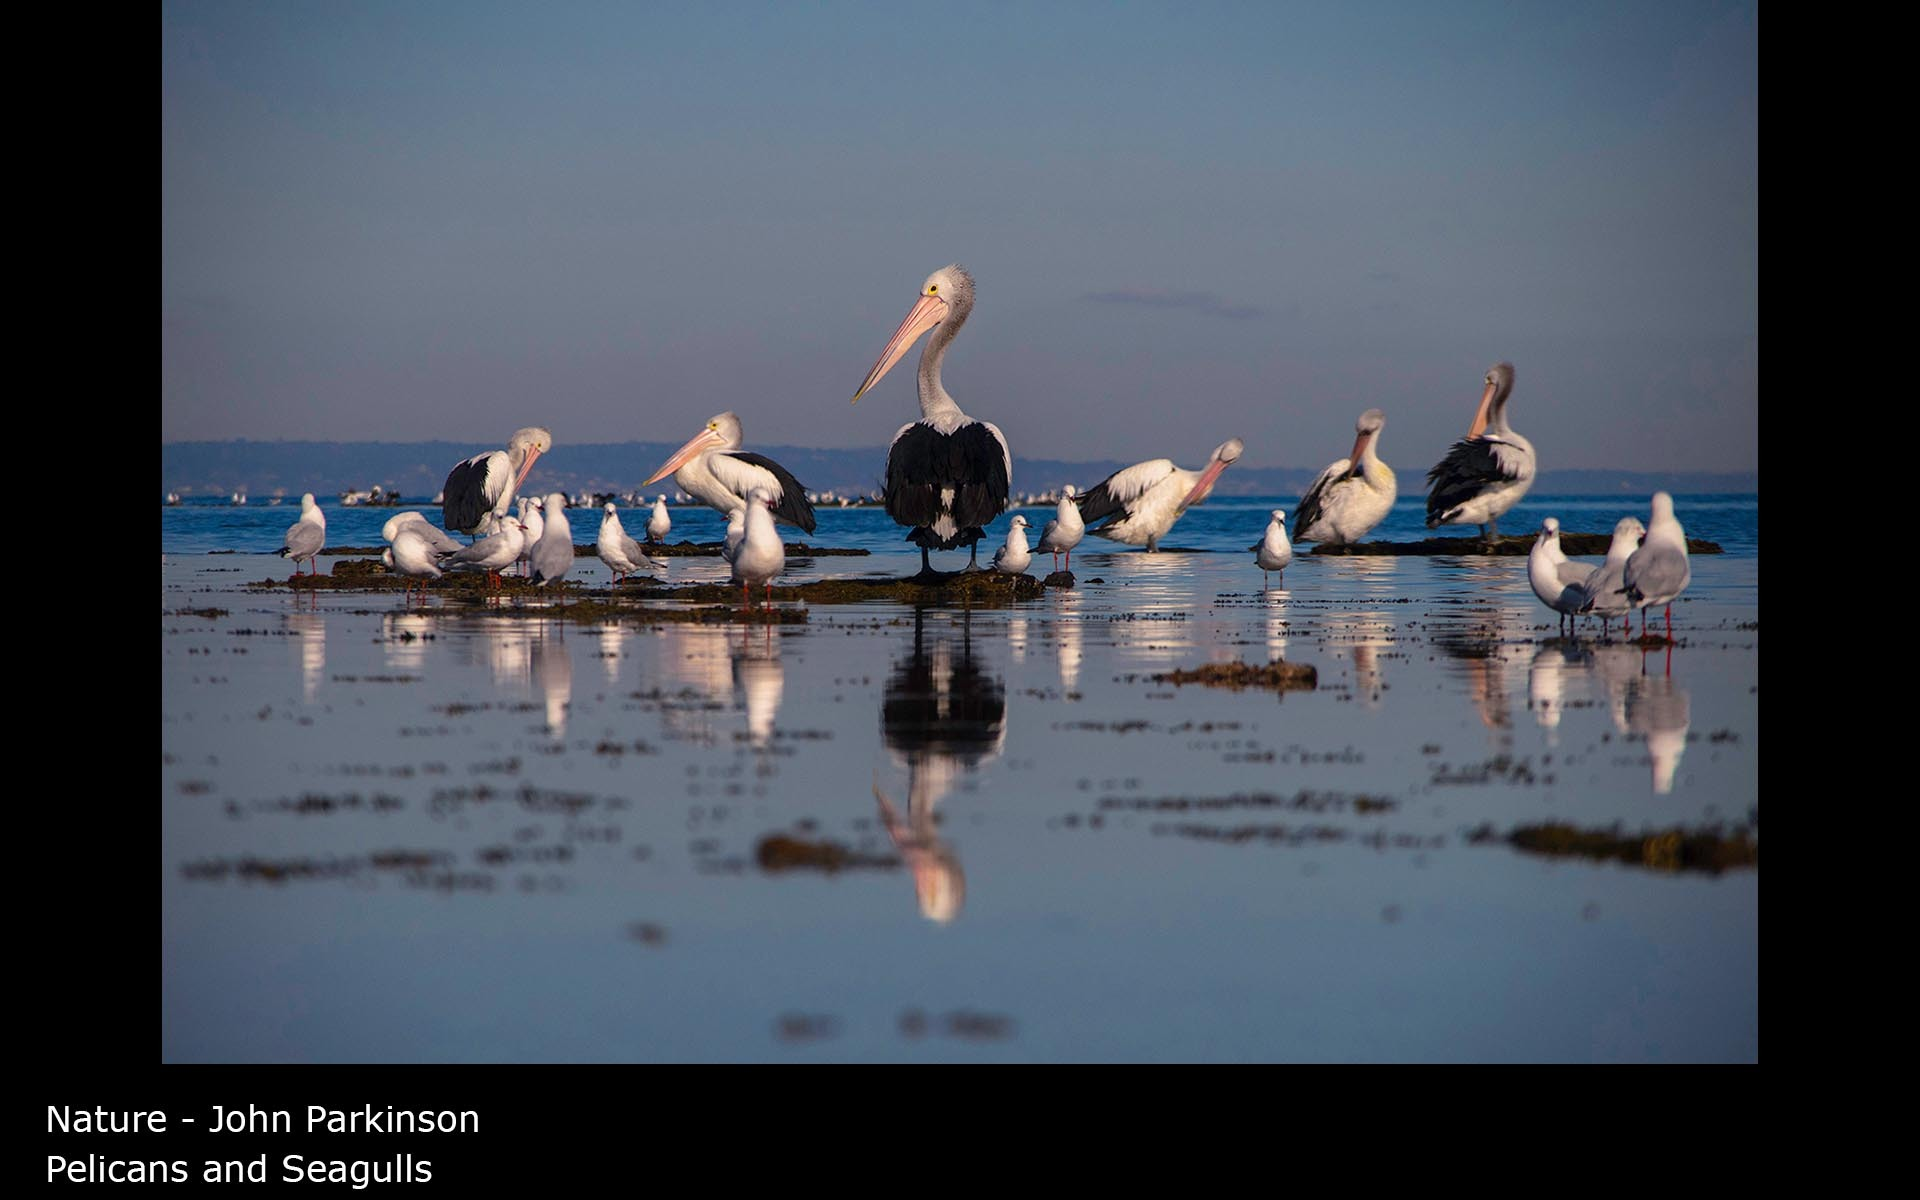 Pelicans and Seagulls - John Parkinson